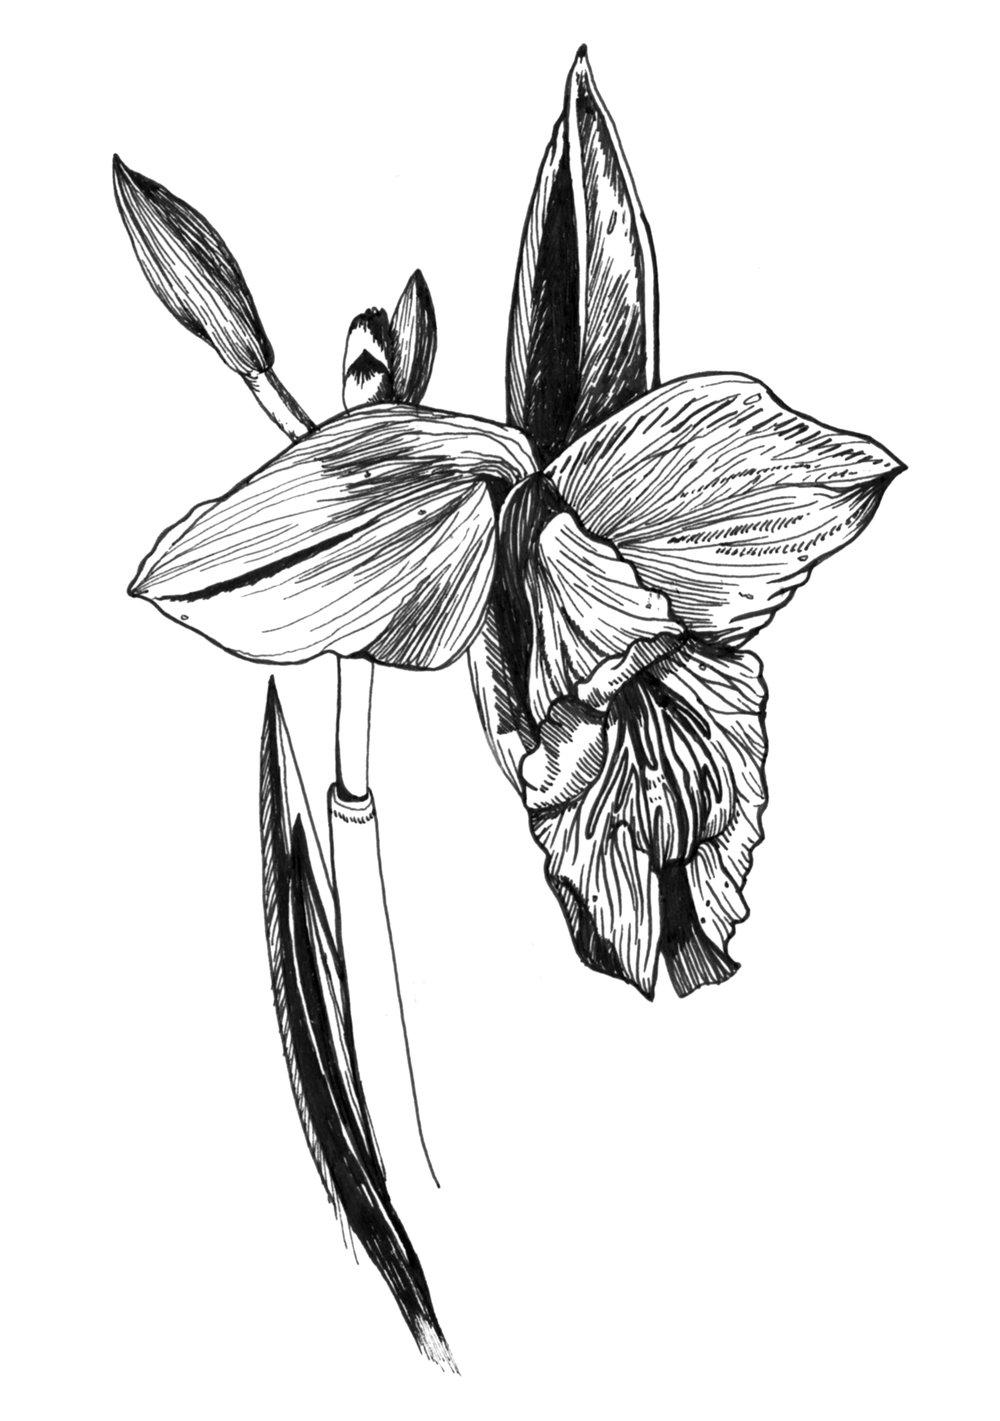 Orchid_CostaRica_Jan14_2017 copy.jpg